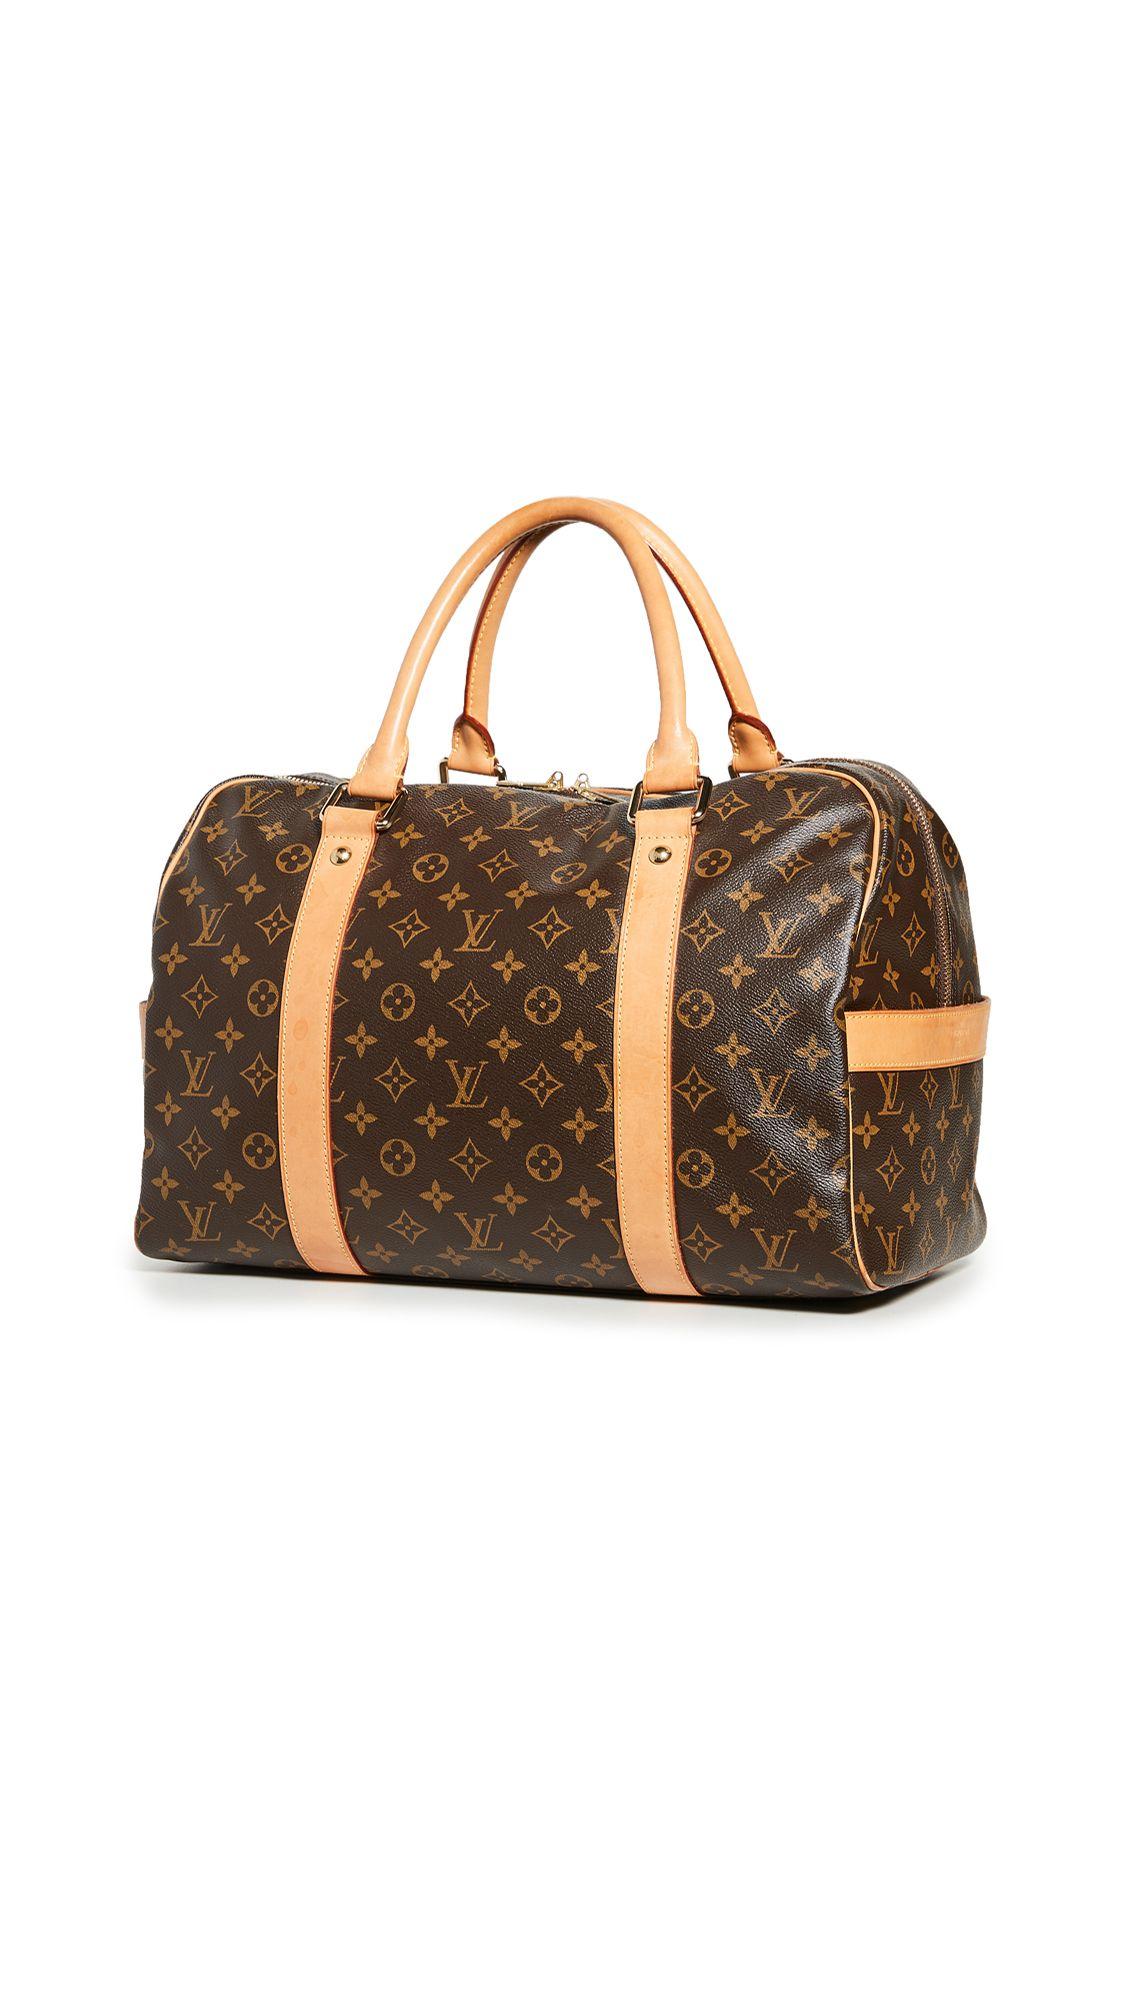 Lv Monogram Carryall In Brown In 2020 Lv Monogram Carryall Louis Vuitton